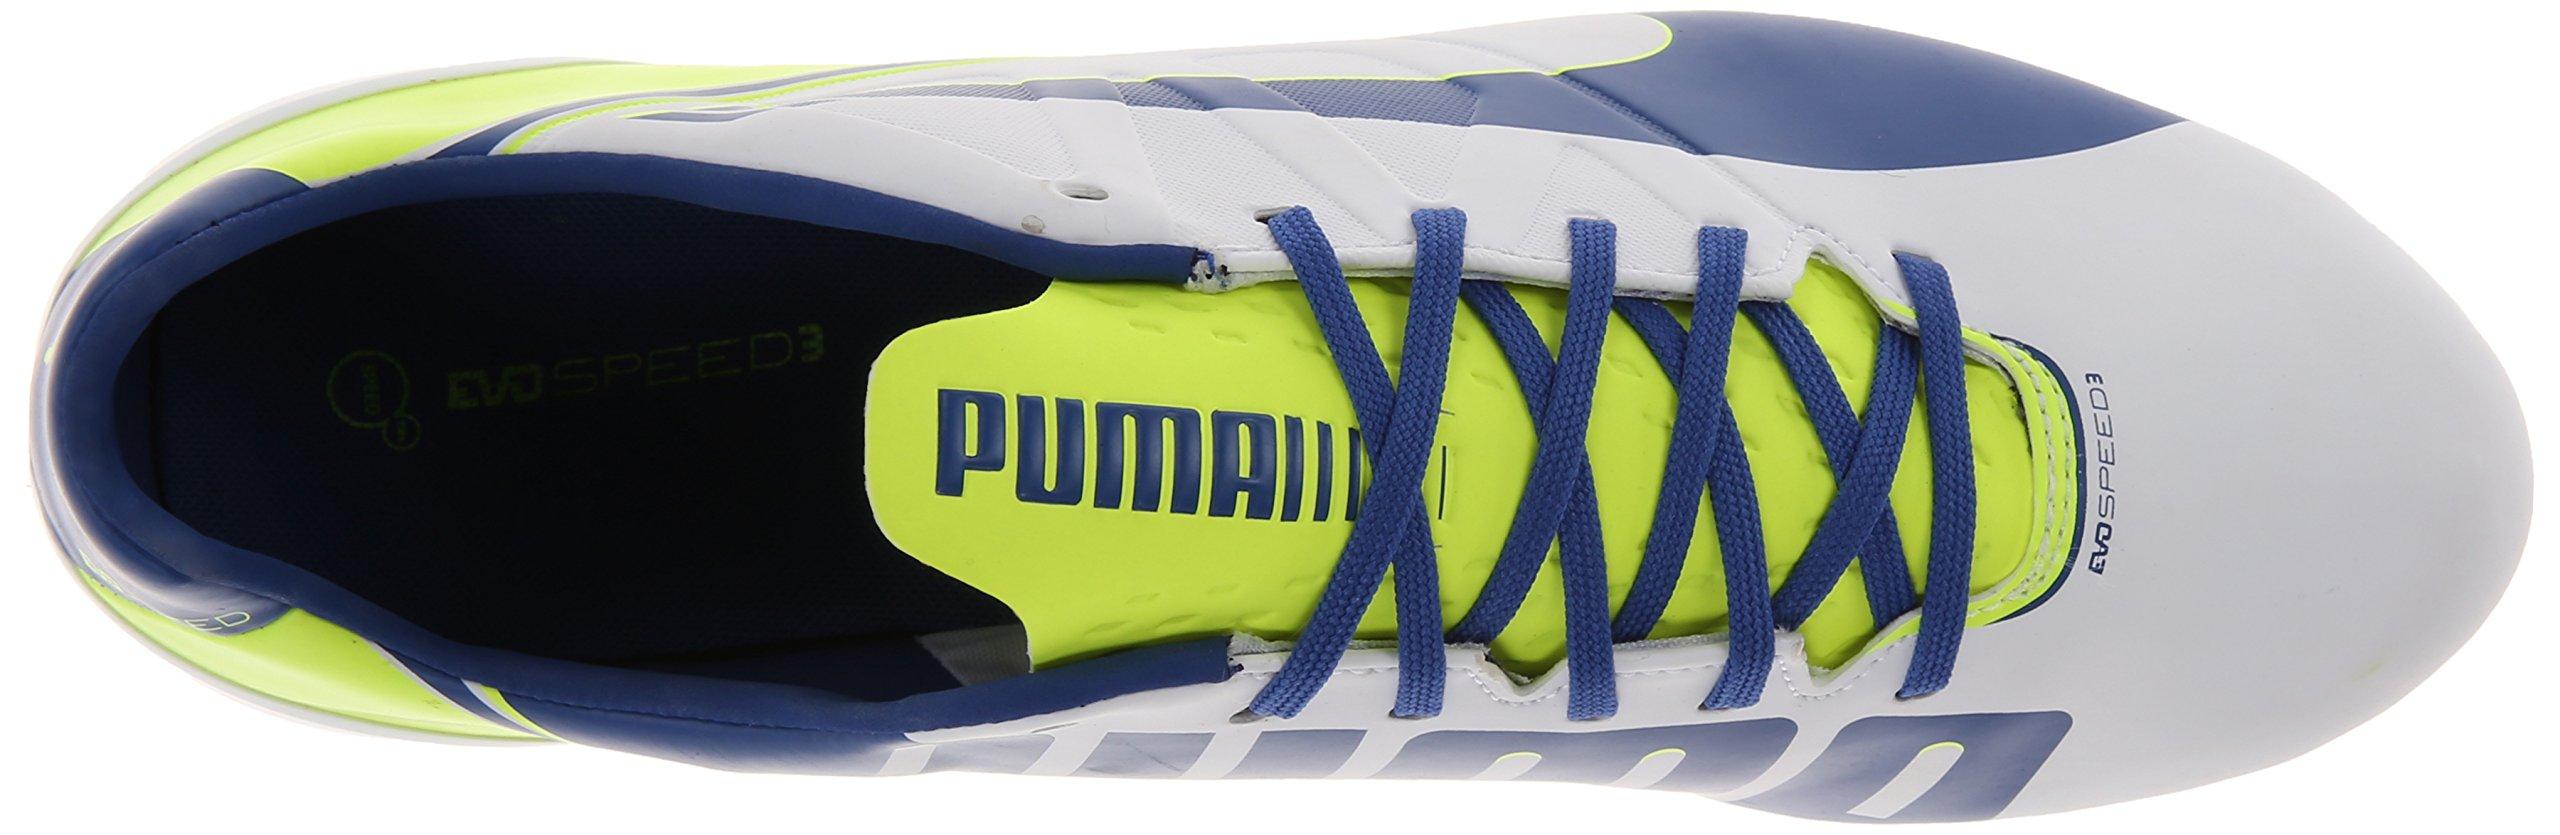 PUMA Women's Evo Speed 3.3 Firm Ground Soccer Shoe,White/Snorkel Blue/Fluorescent Yellow,8 B US by PUMA (Image #8)